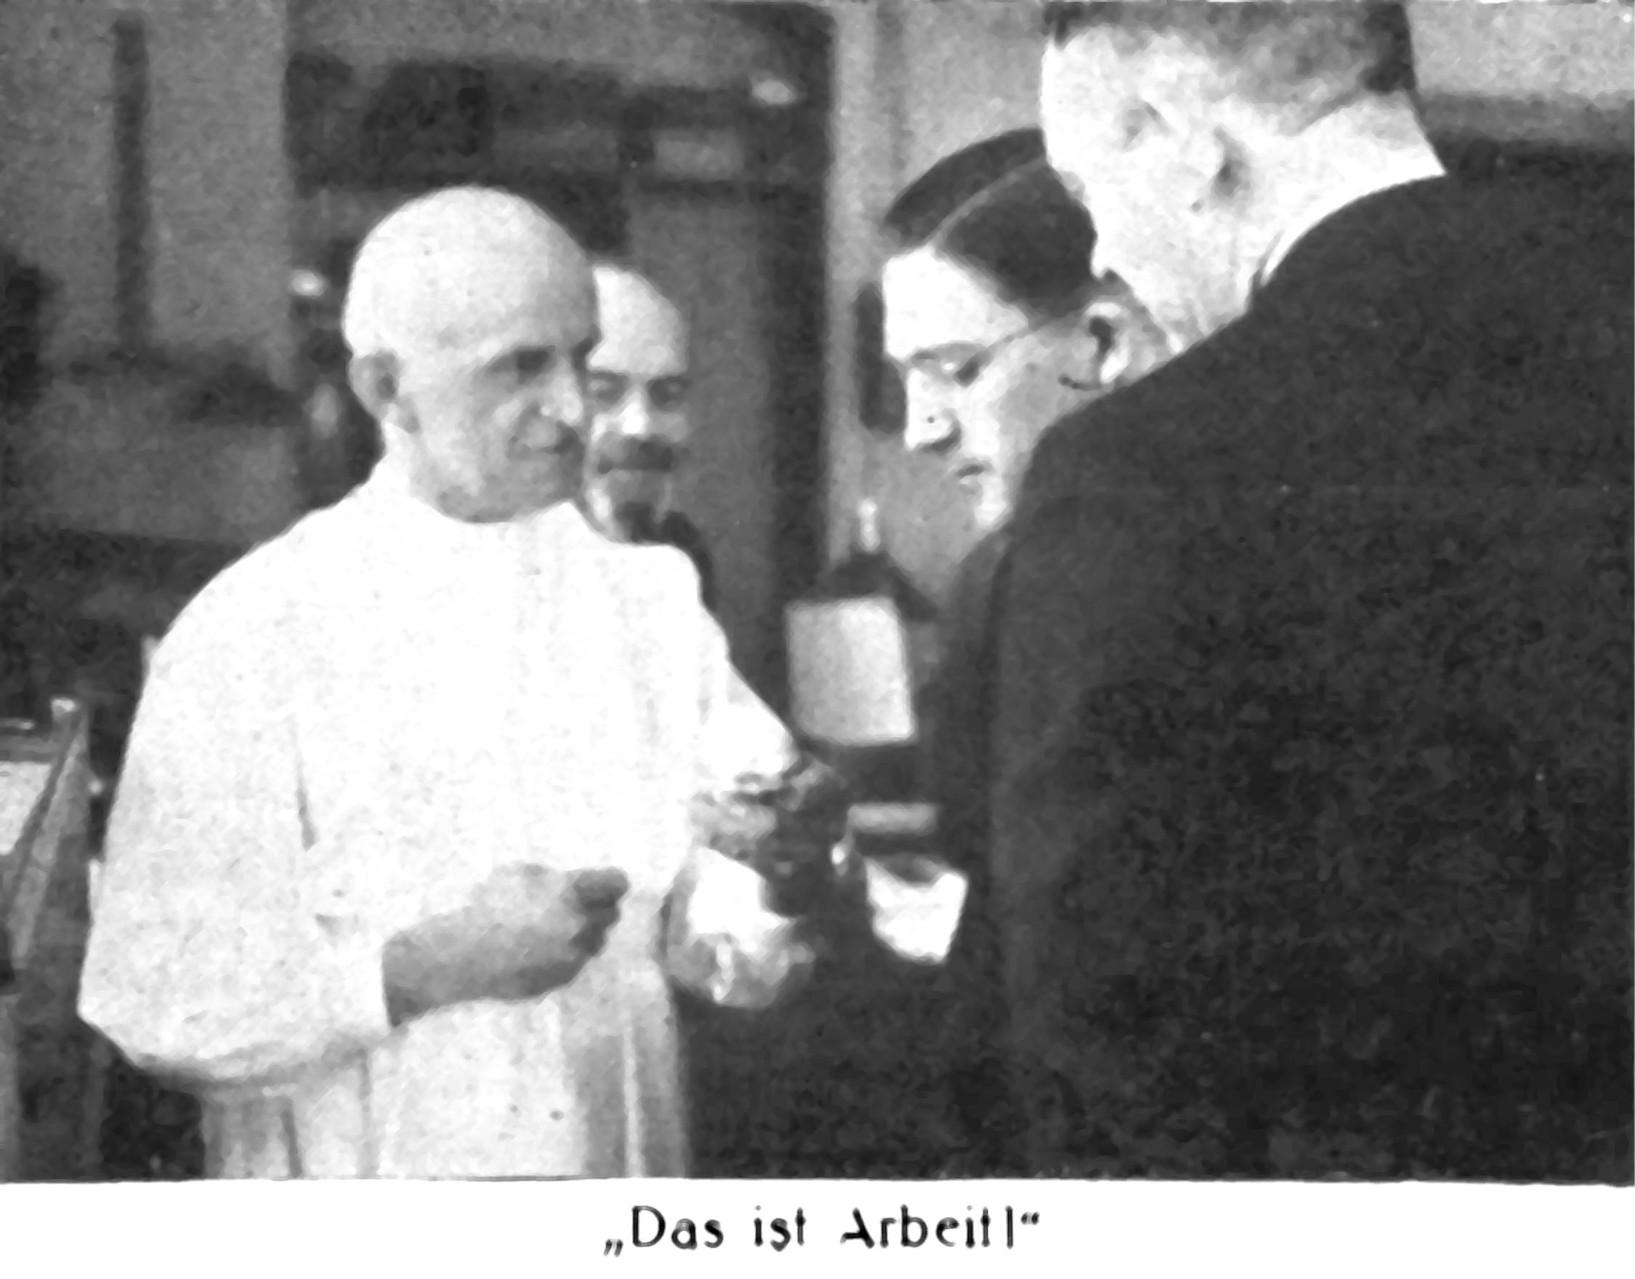 v.l. Studienrat Alfrde Helwig, Studiendirektor Giebel